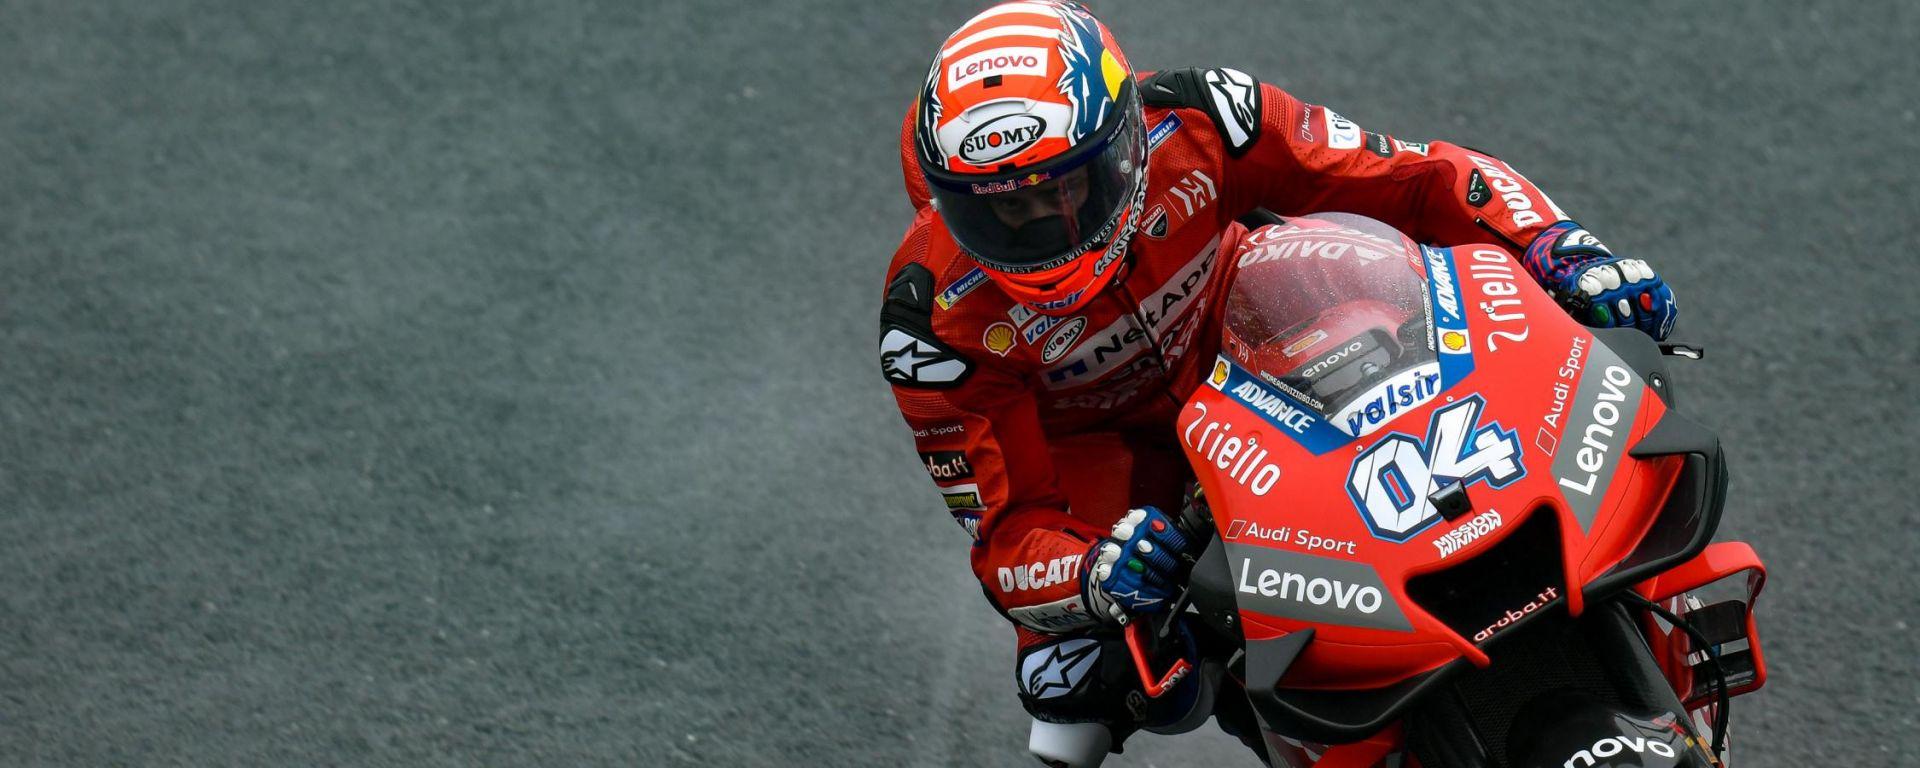 MotoGP Giappone 2019, Motegi: Andrea Dovizioso (Ducati)